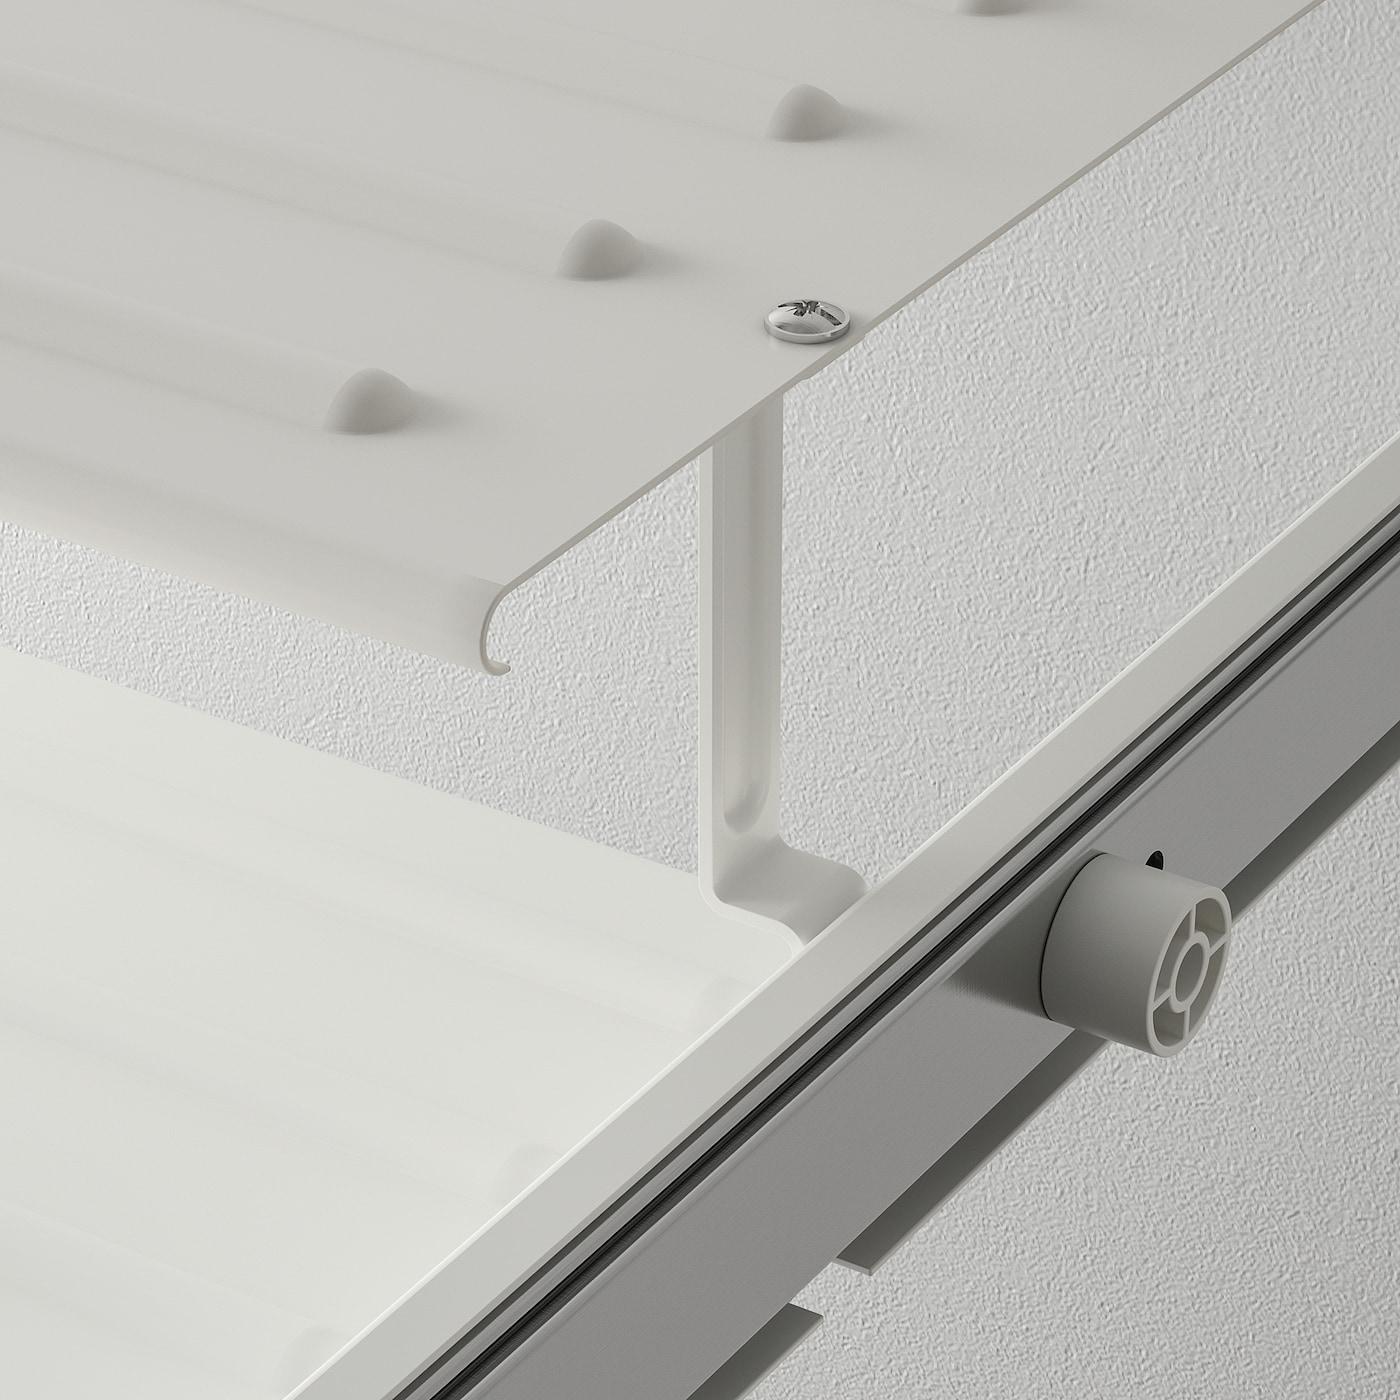 KOMPLEMENT Schuhregal, ausziehbar, weiß, 50x58 cm